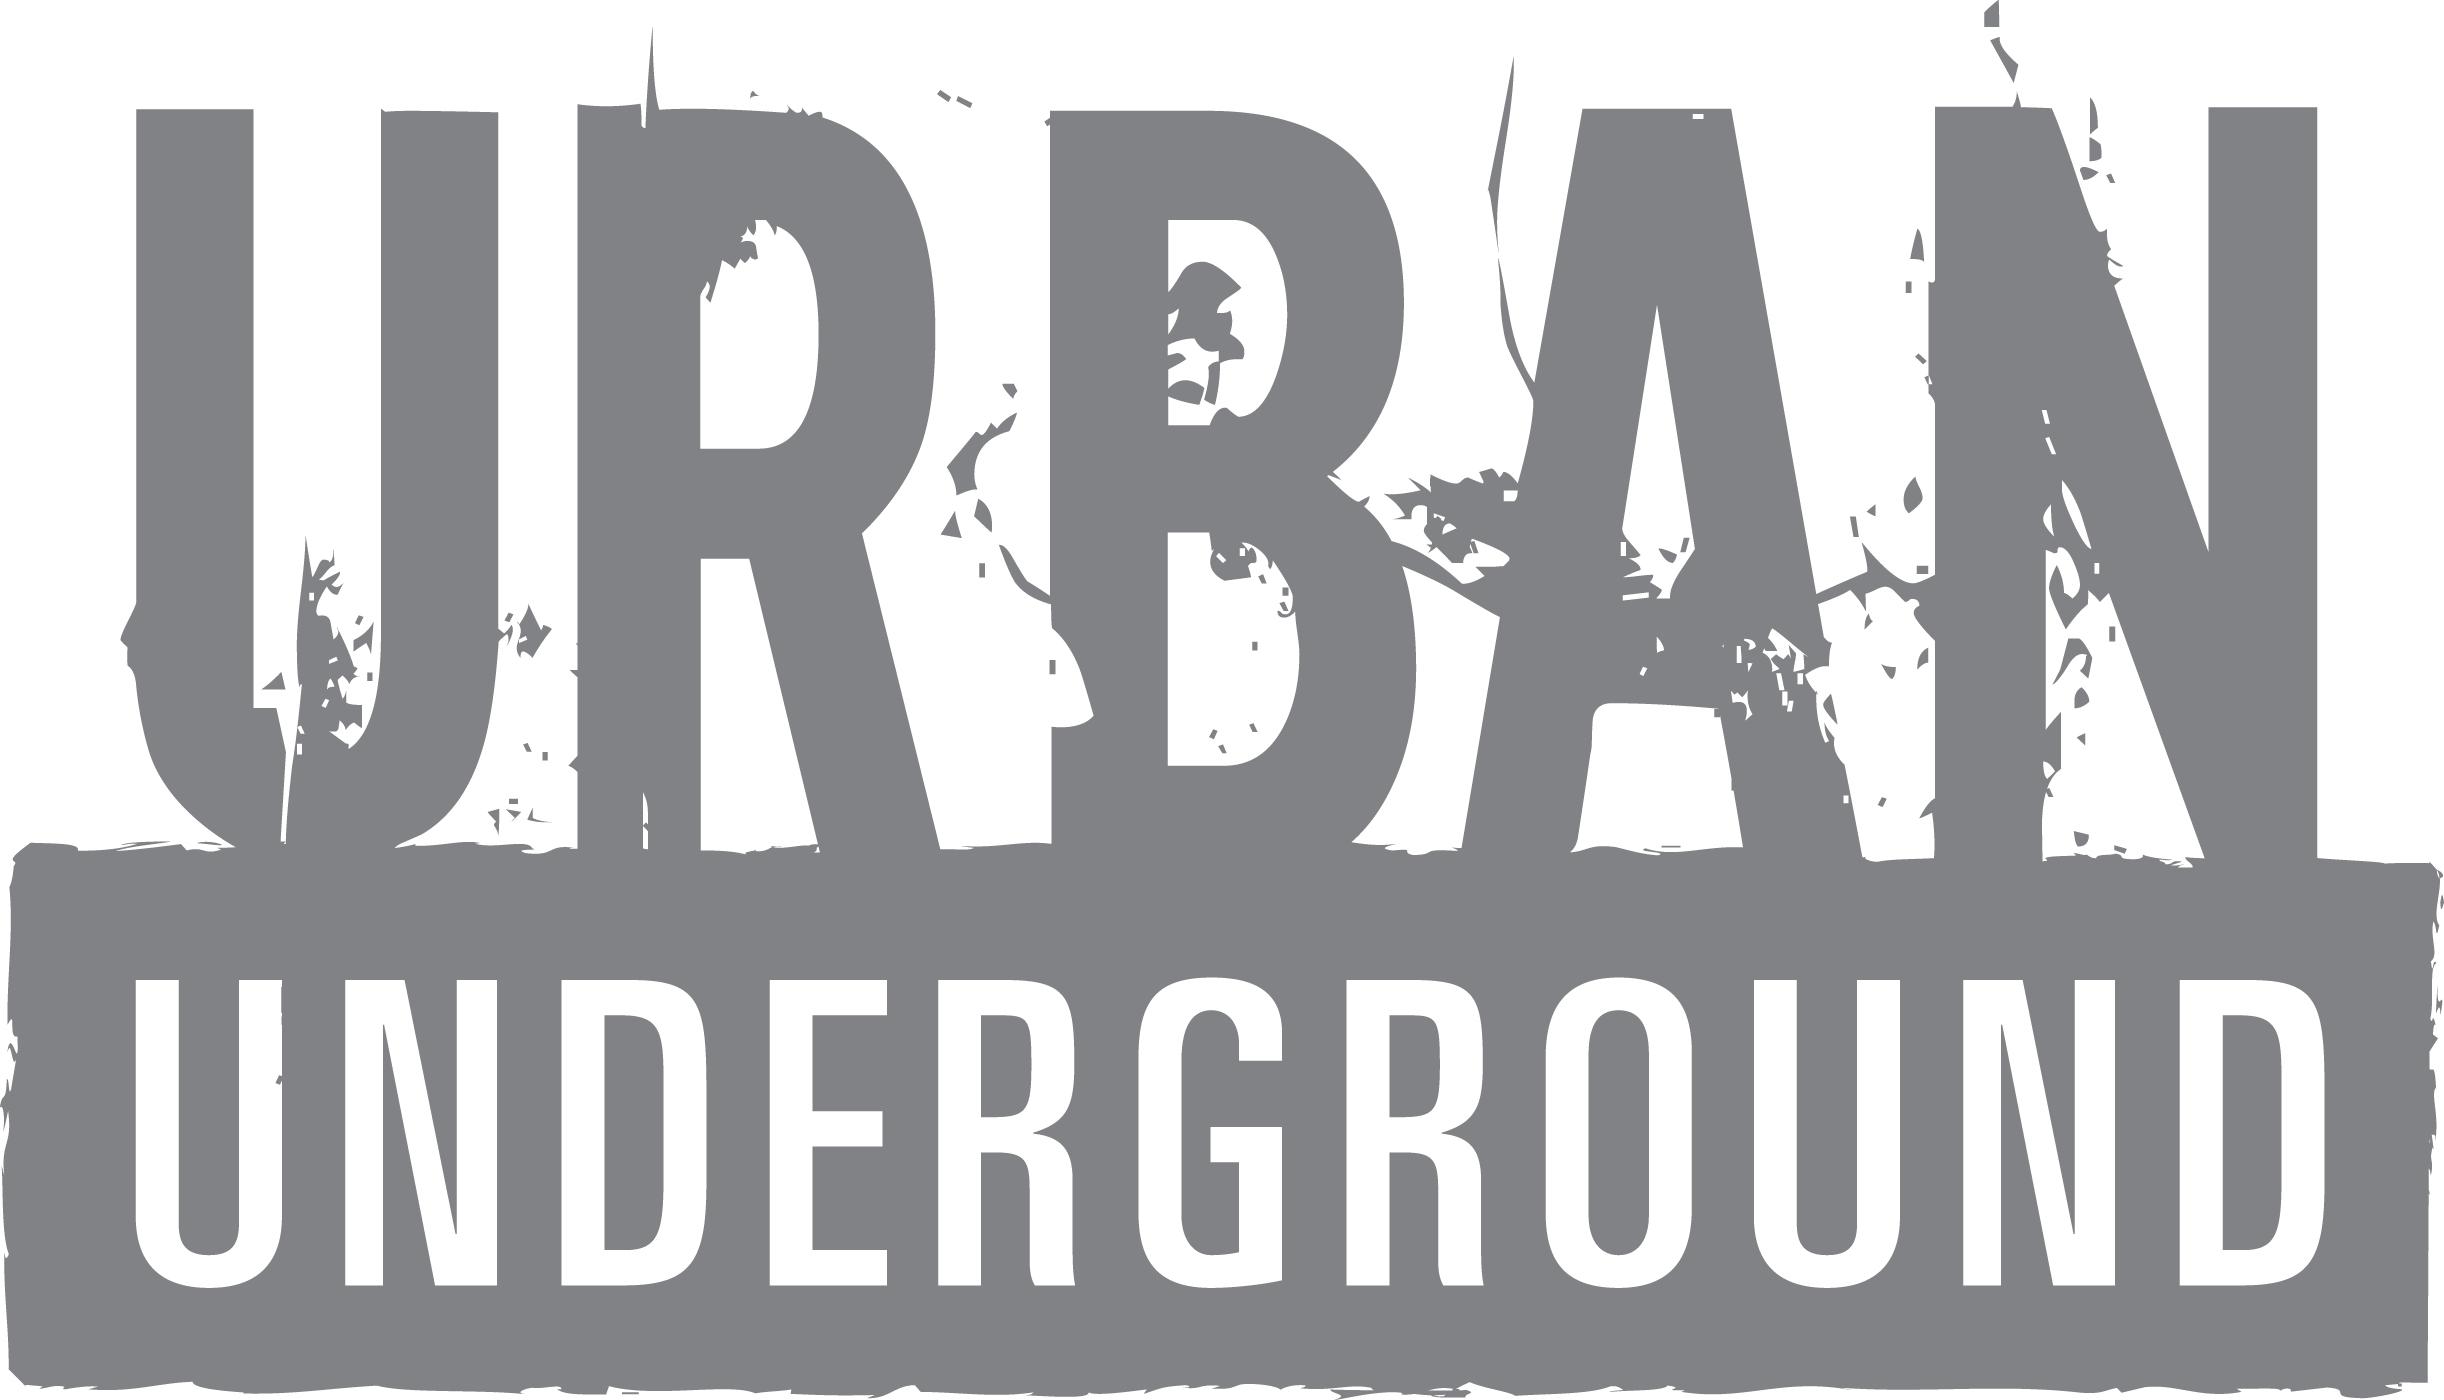 urbanunderground-logo.jpg